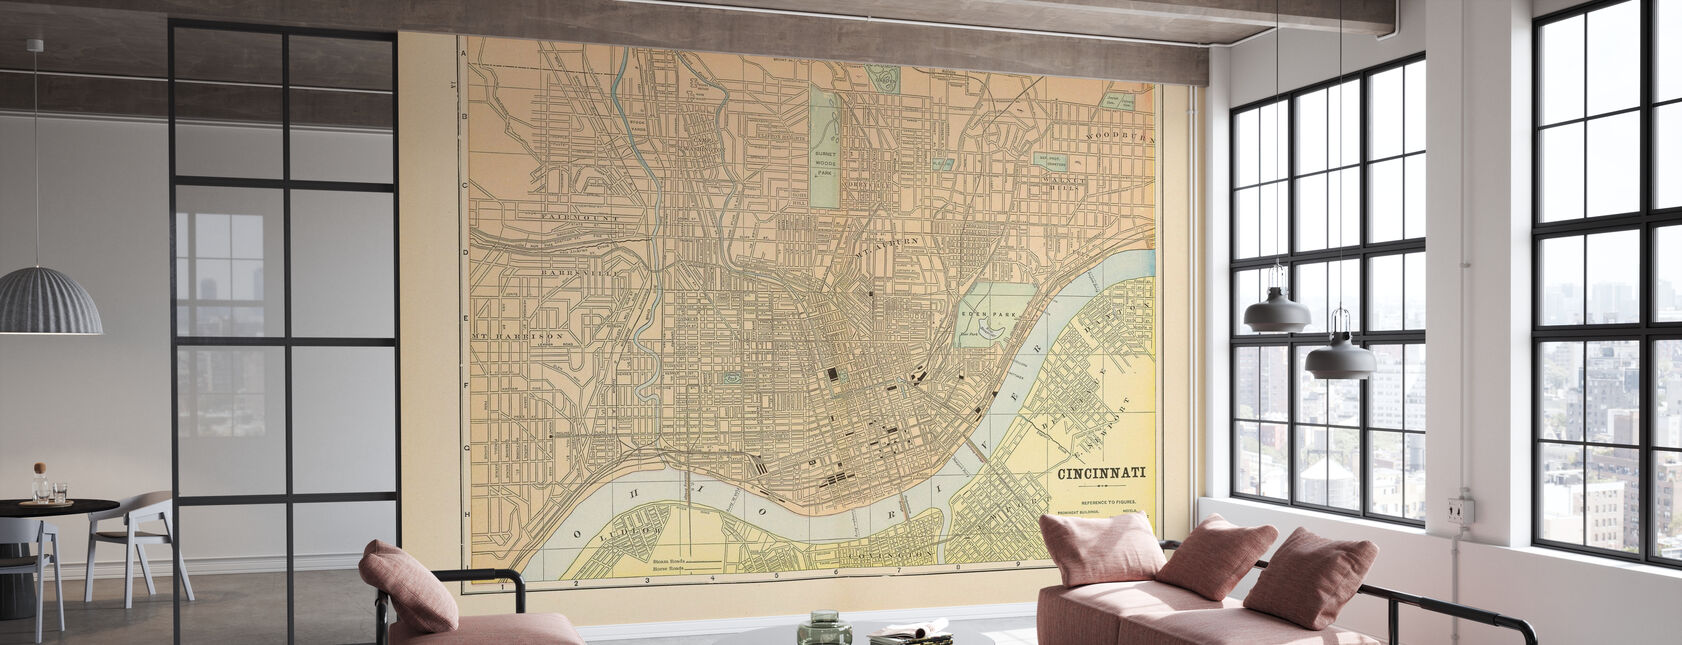 Map of Cincinnati - Wallpaper - Office